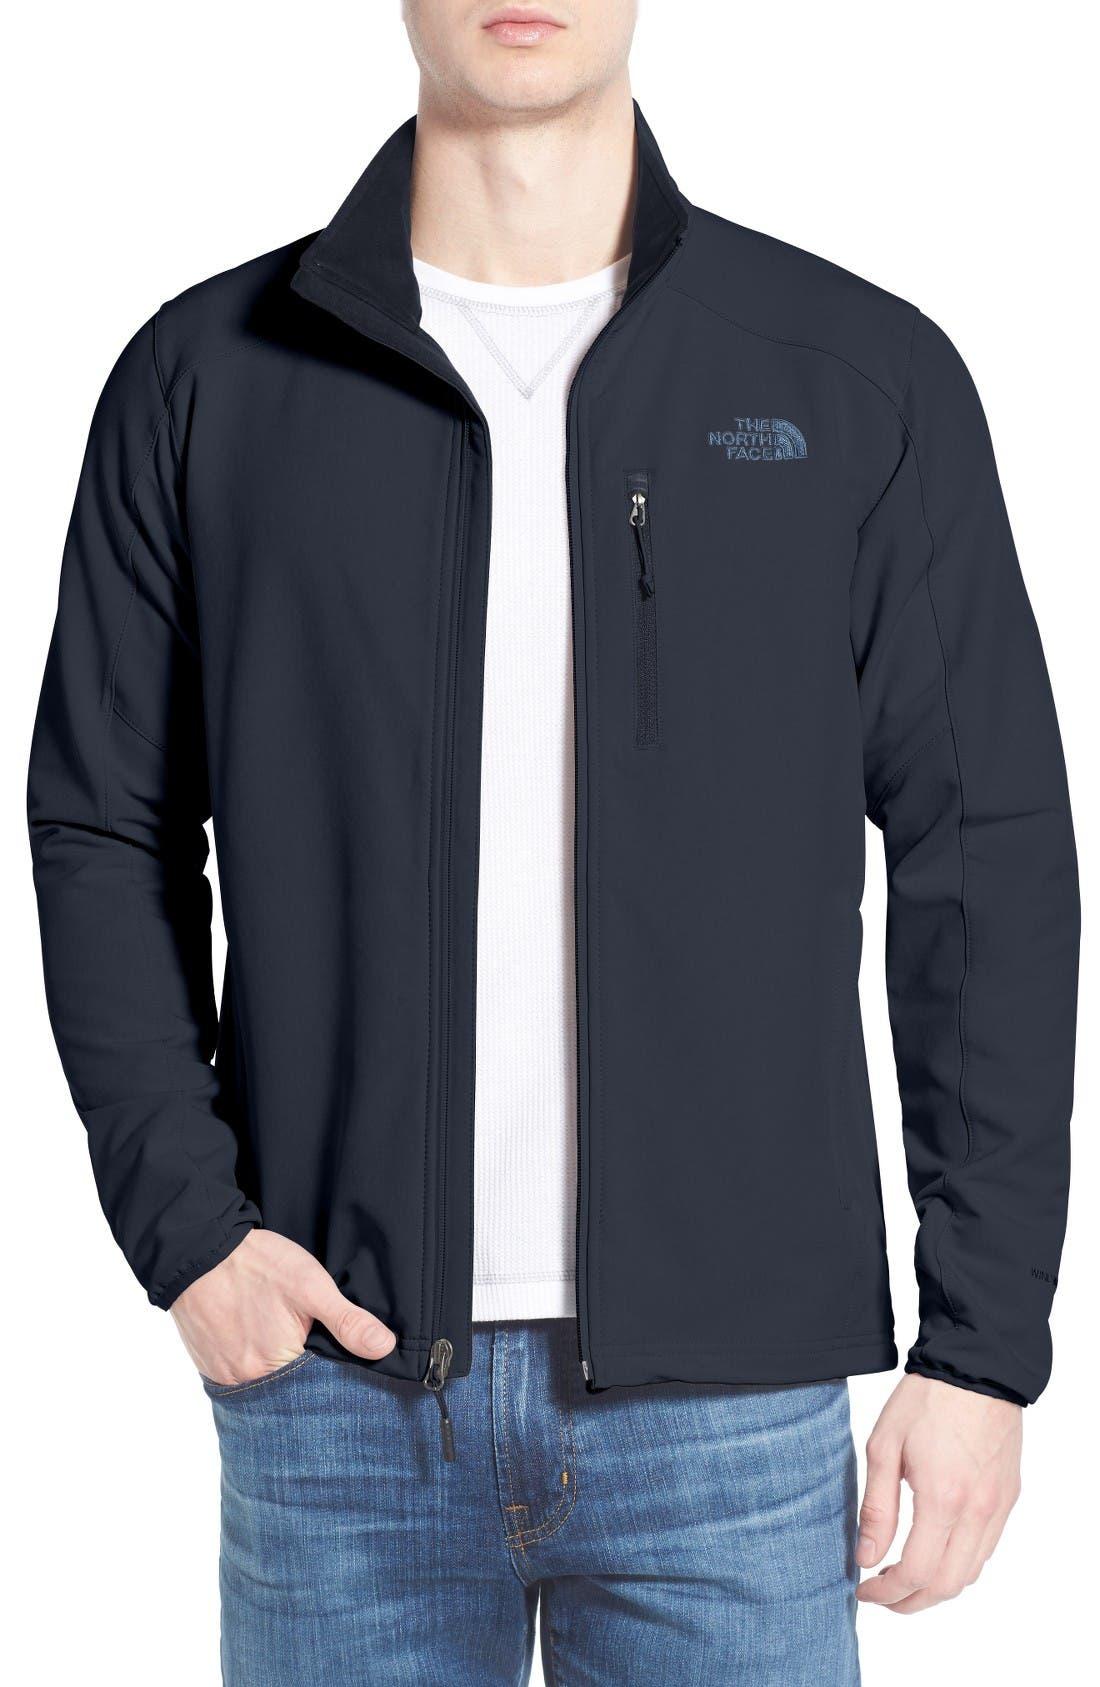 Apex Pneumatic Jacket,                         Main,                         color, Urban Navy/ Urban Navy